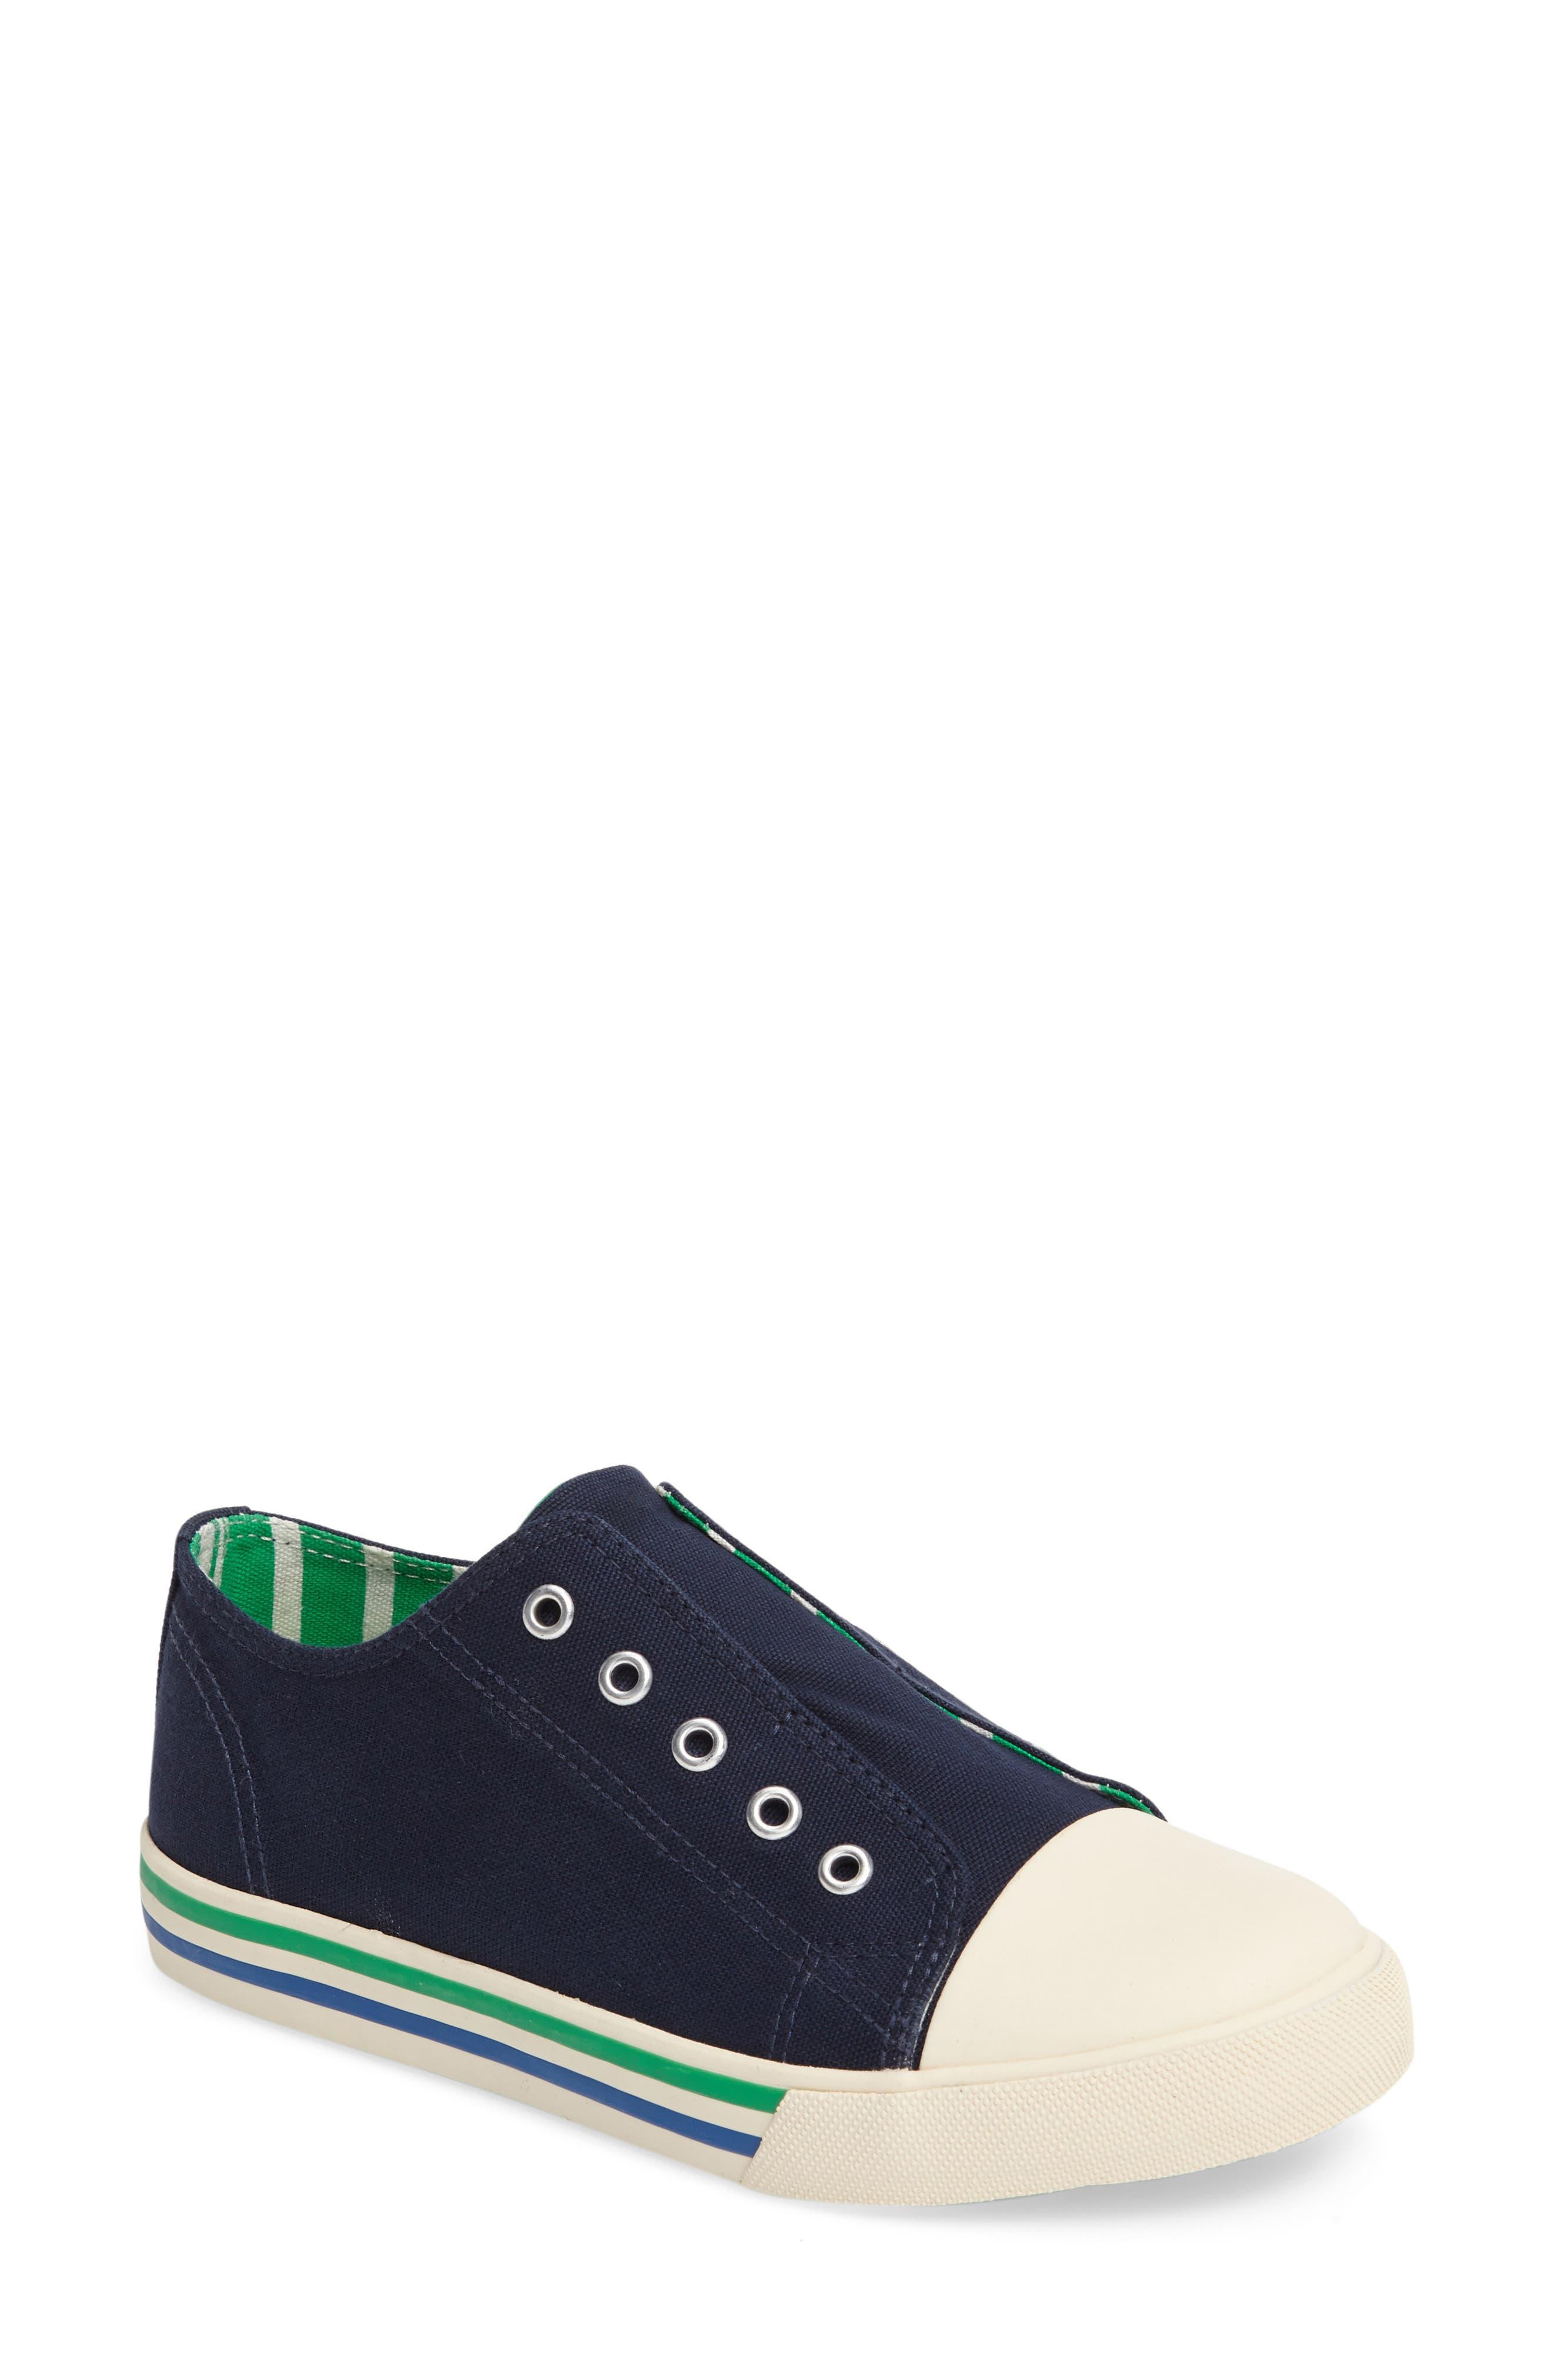 Alternate Image 1 Selected - Mini Boden Laceless Sneaker (Toddler, Little Kid & Big Kid)